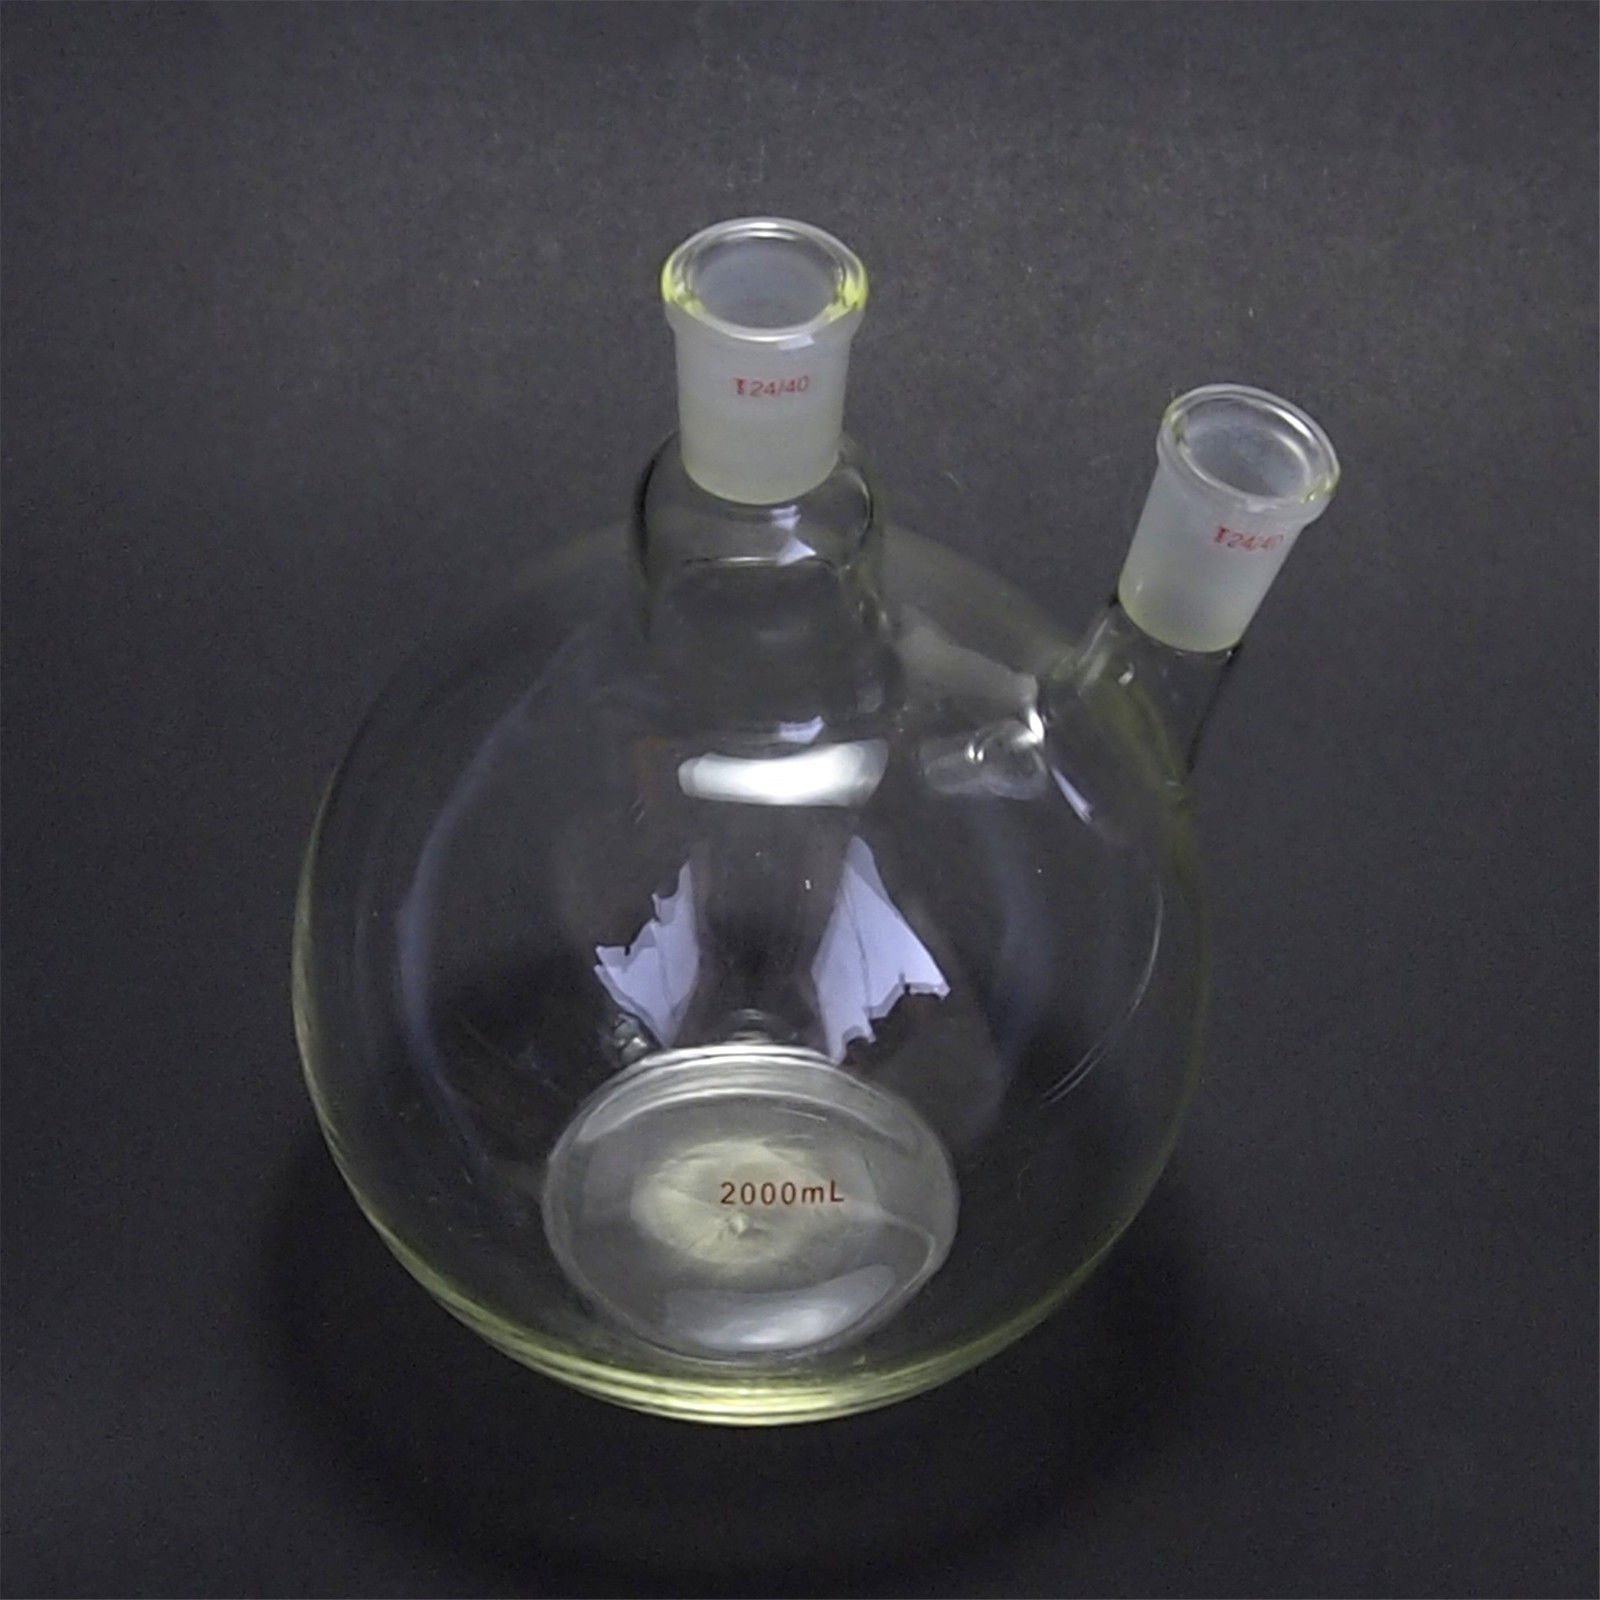 Deschem 2000ml,24/40,2-Neck,Flat Bottom Glass Flask,2L,Two Necks,Laboratory Vessel